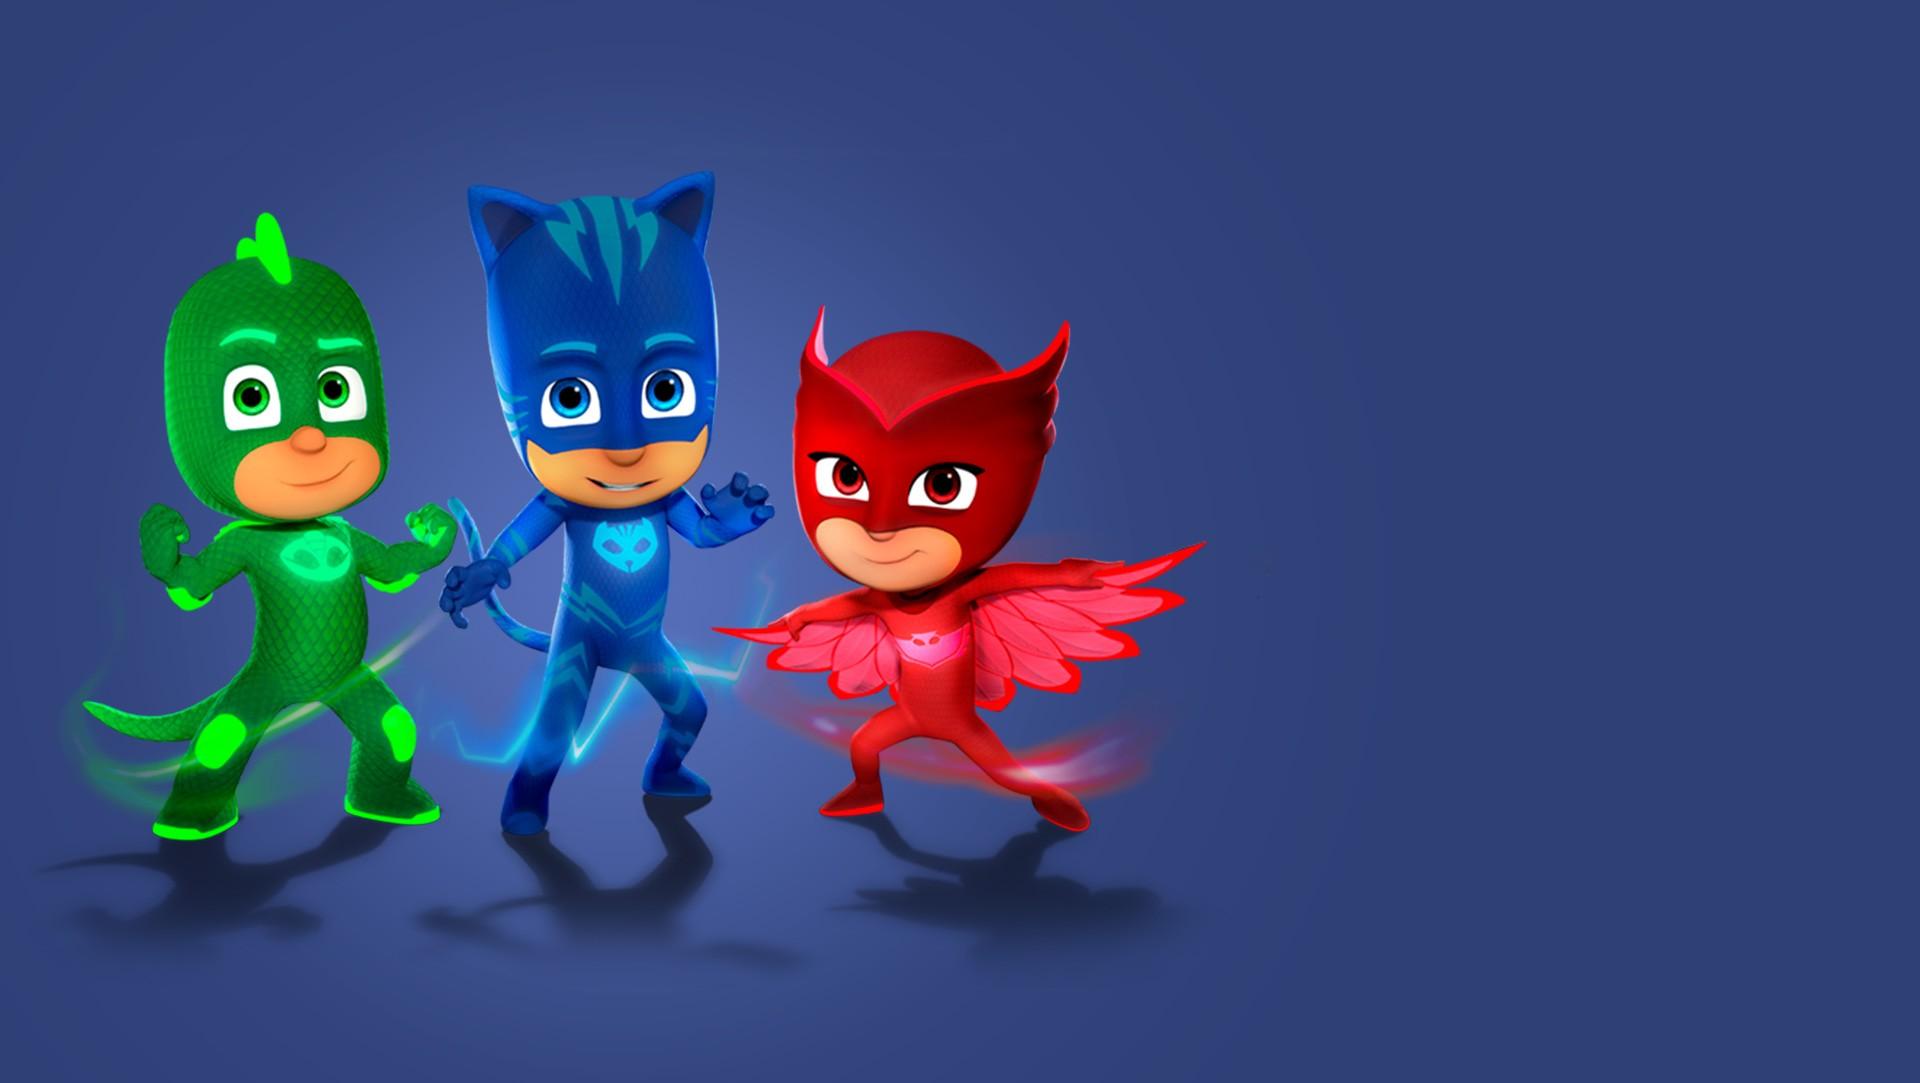 Download PJ Masks Super City Run on PC with BlueStacks